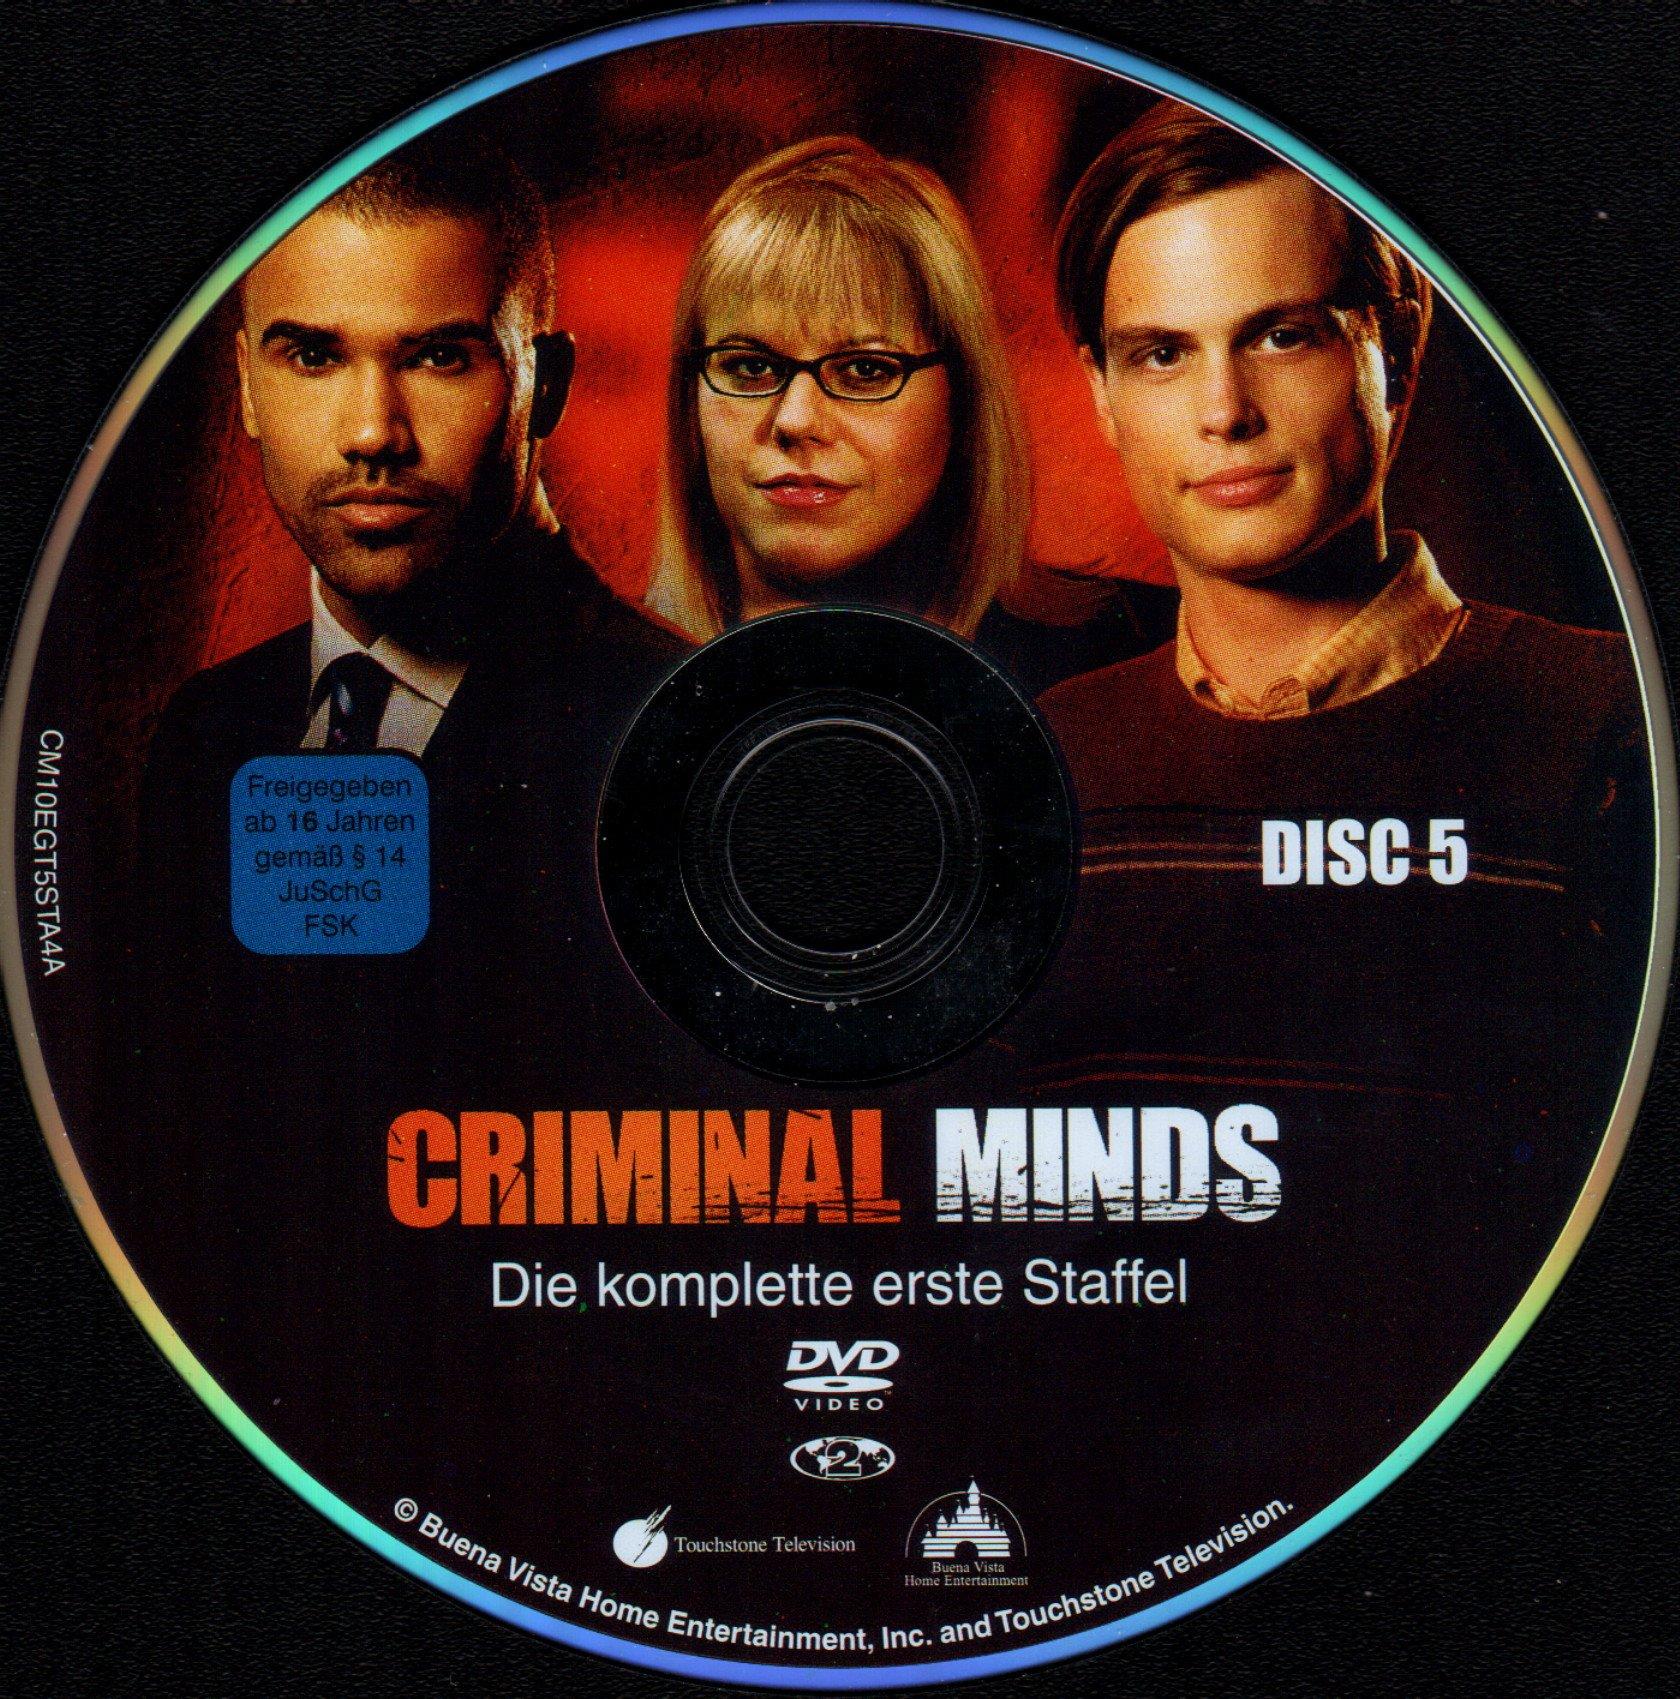 Criminal Minds Staffel 1